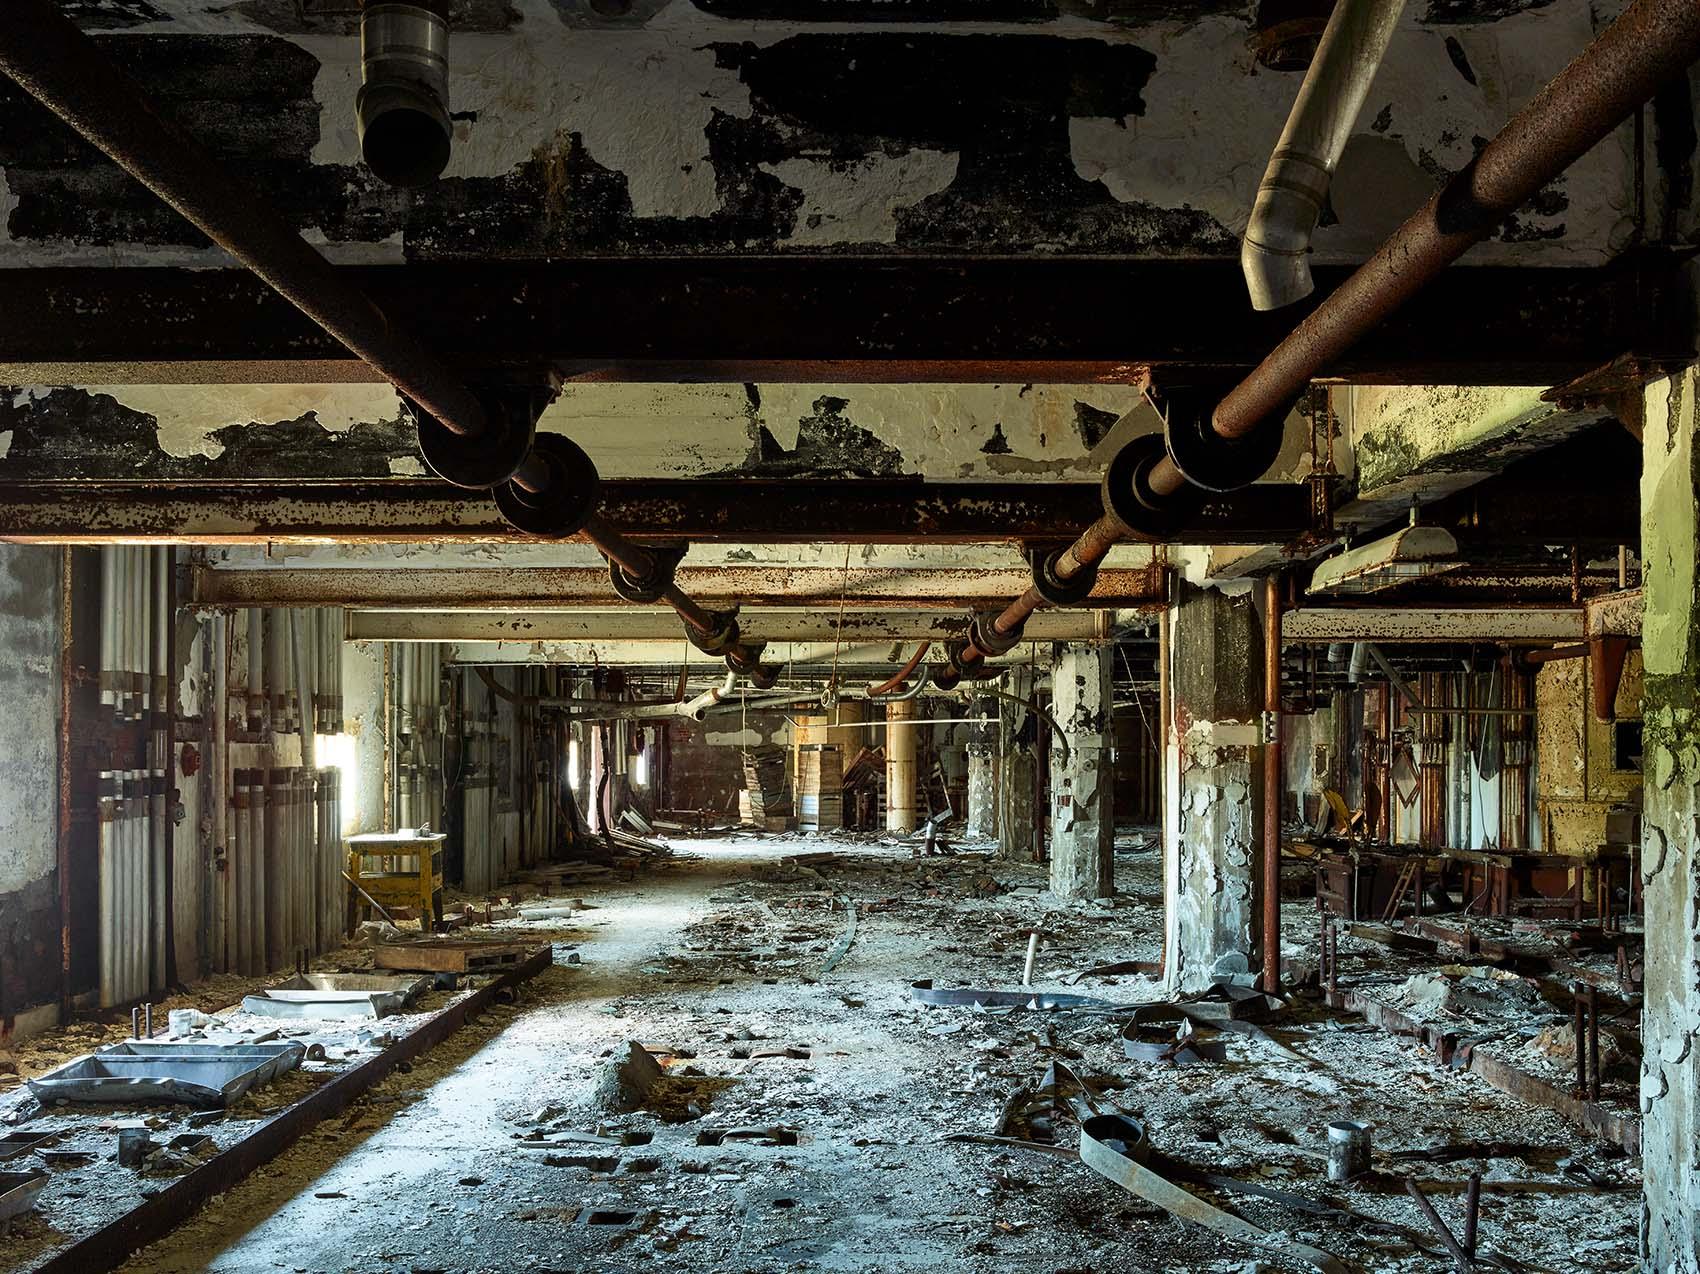 urban decay Silo City rusty American Elevator room